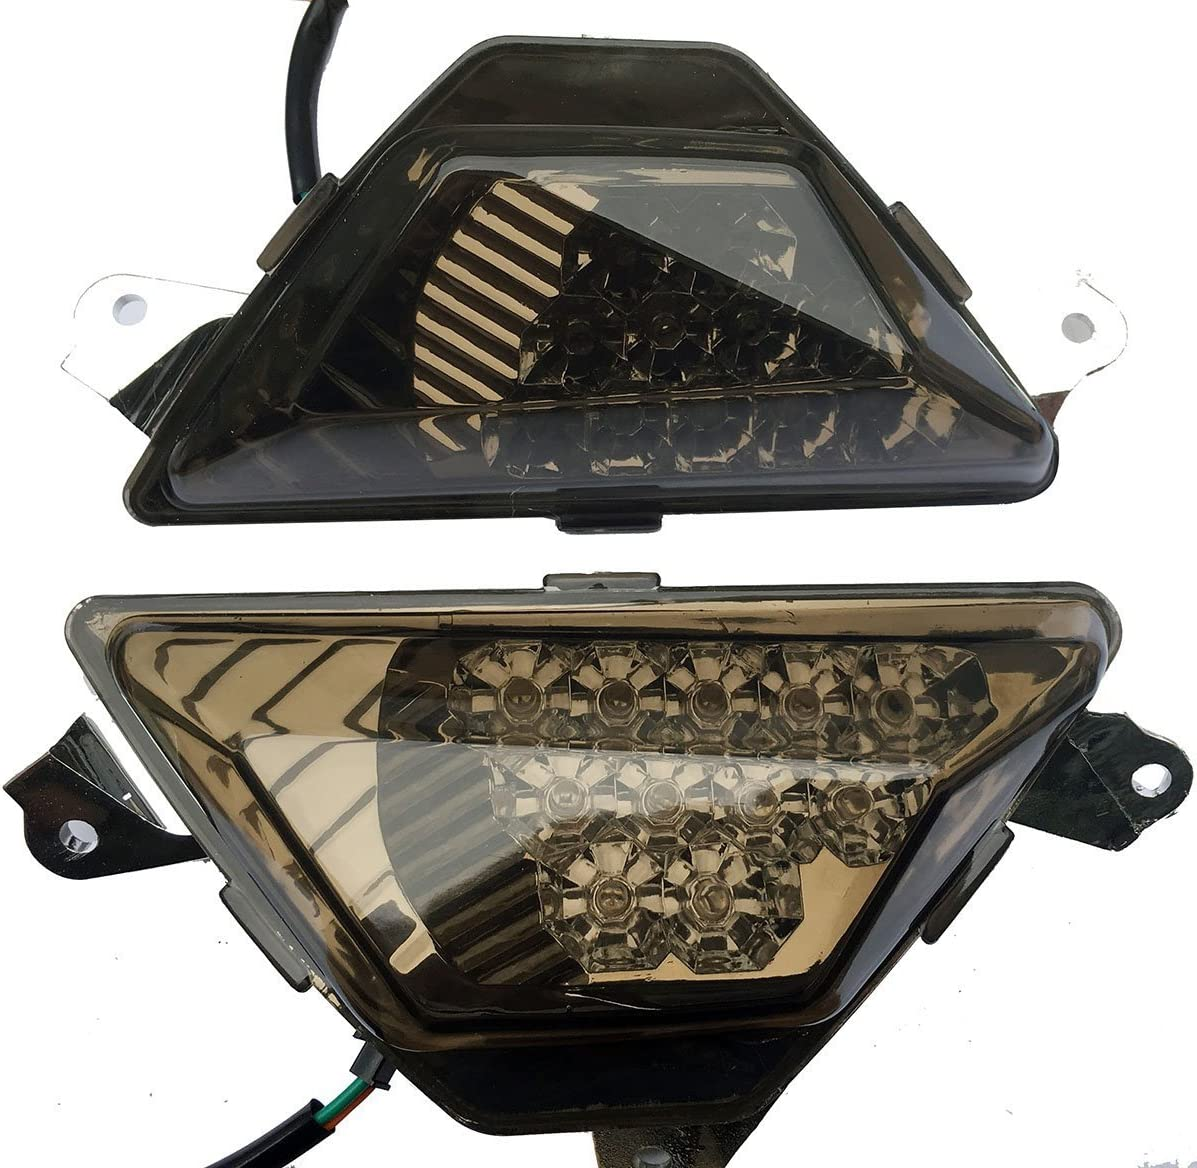 LED Front Turn Signals Blinkers Indicators with Smoke Lens for 2017 Kawasaki Ninja 650 EX650 ABS KRT Edition